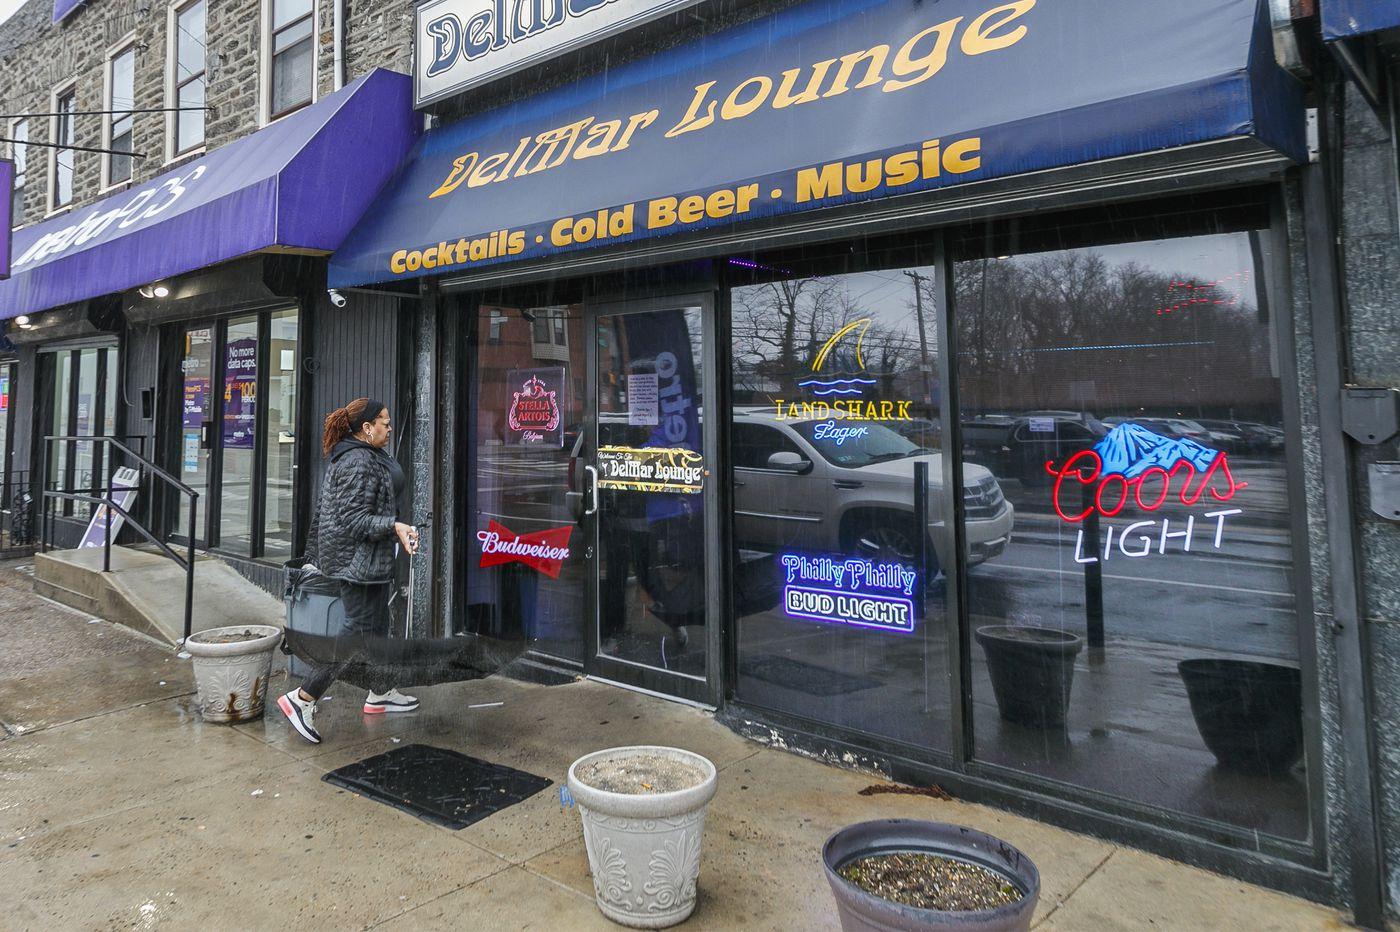 In DelMar Lounge robbery, killing, person of interest taken into custody